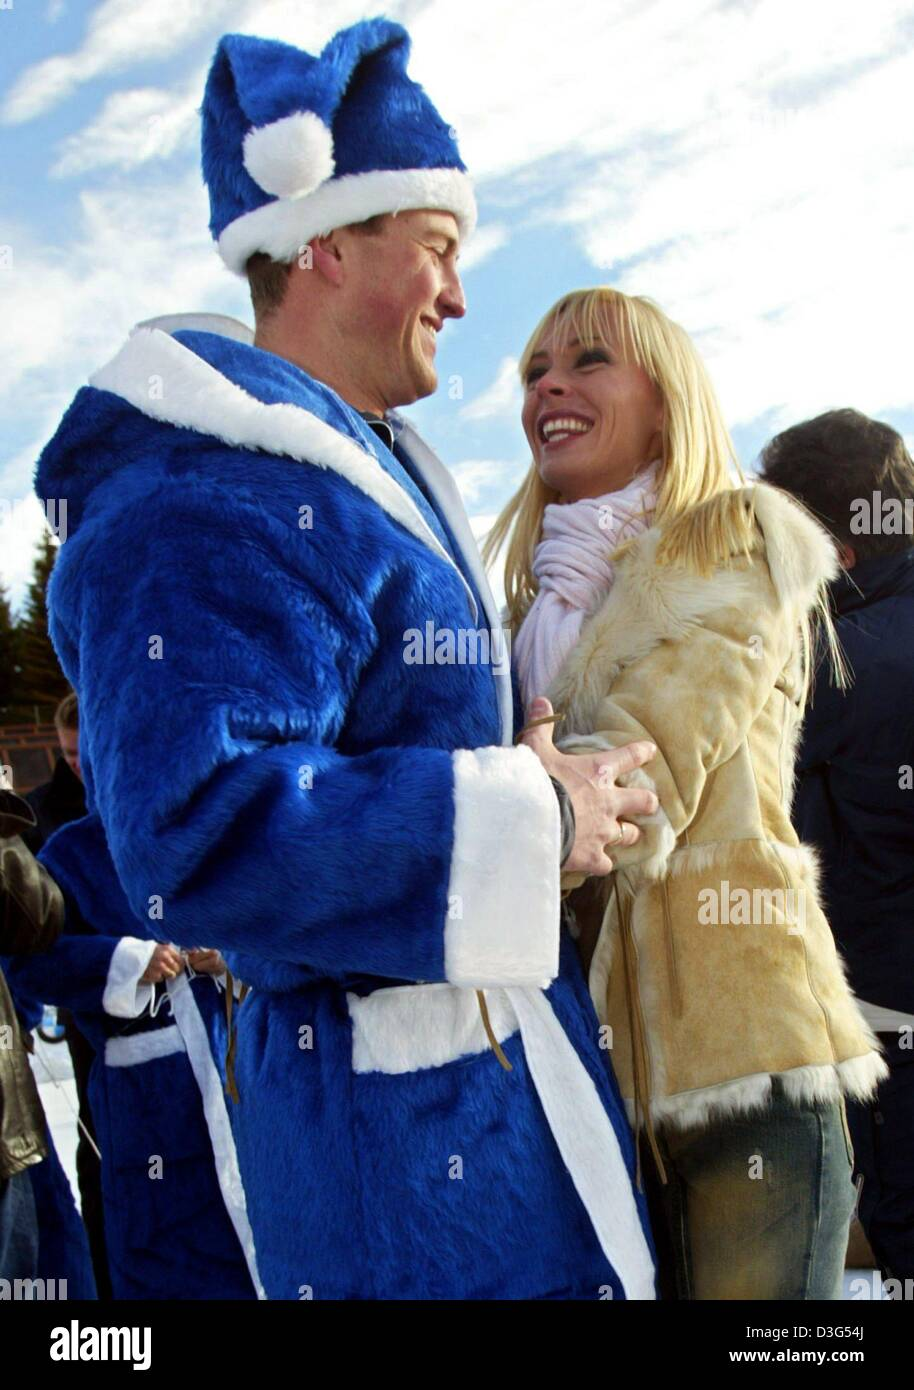 Dpa German Formula One Driver Ralf Schumacher Dressed In A Blue